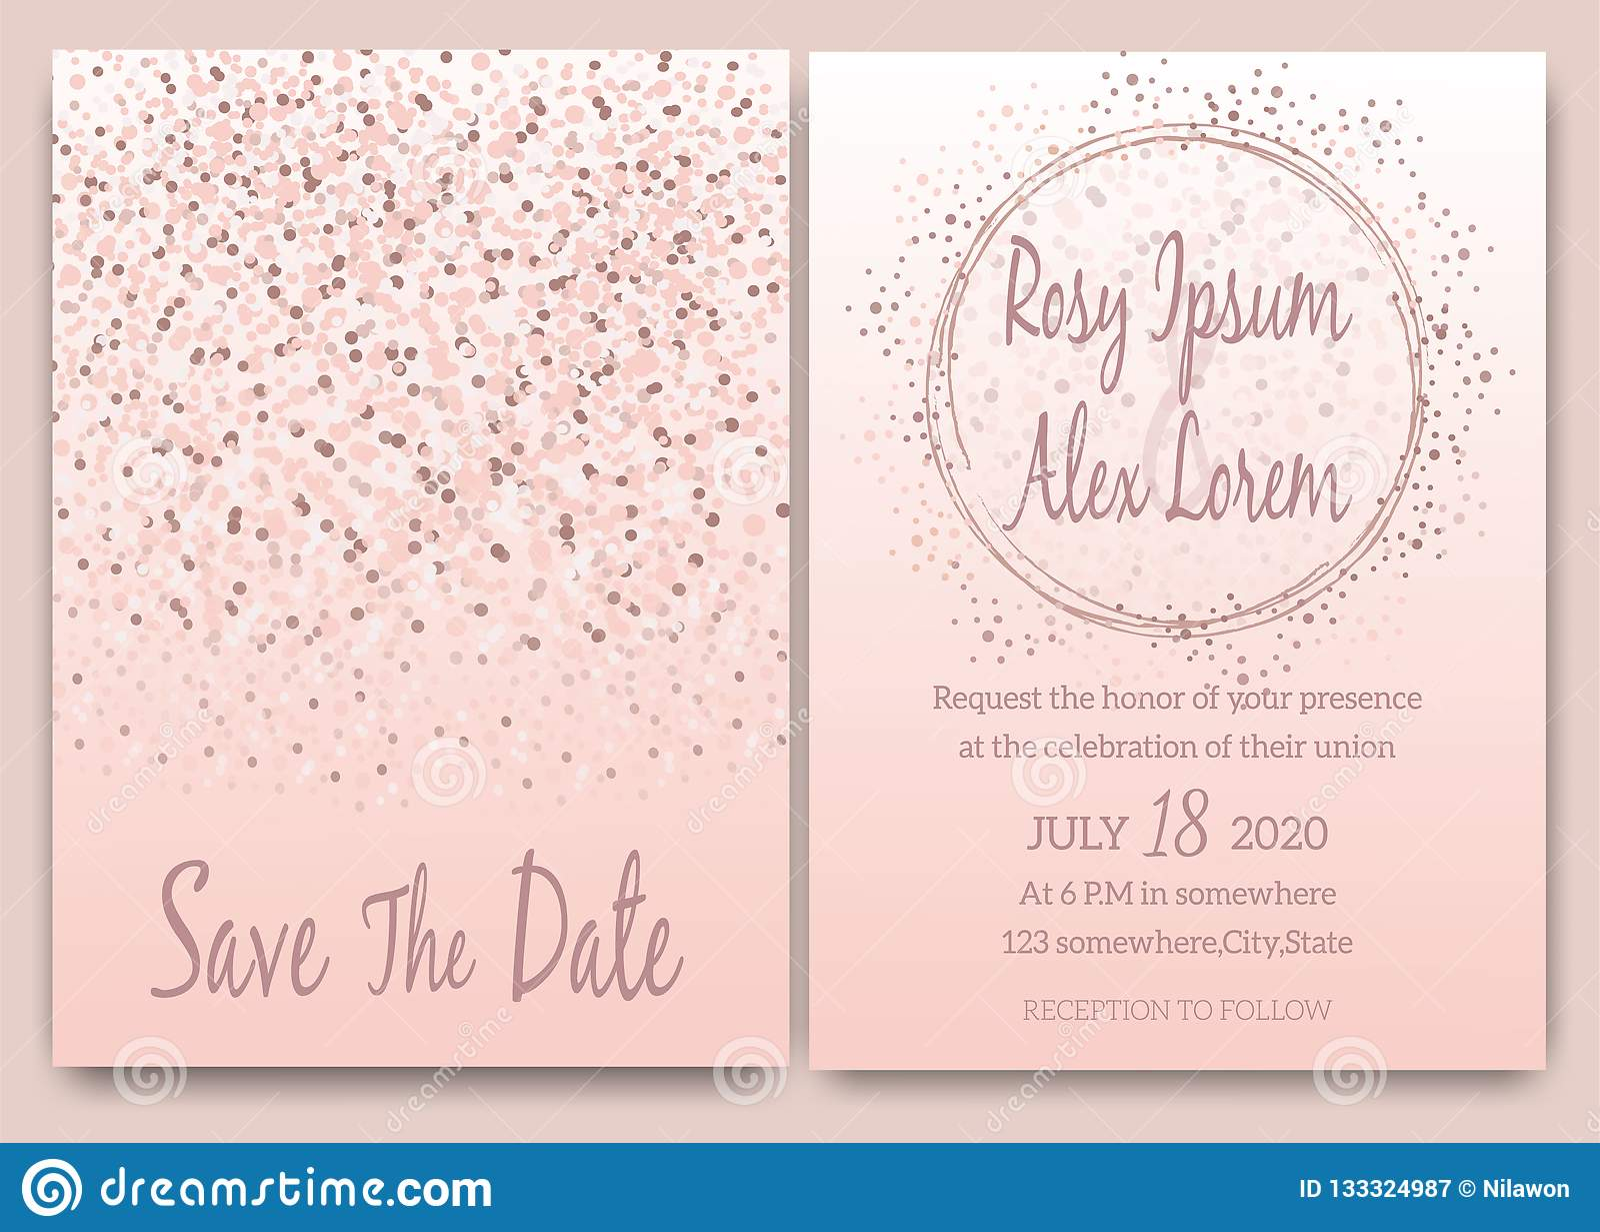 https www dreamstime com rose gold glitter pink wedding card invitation rose gold glitter pink wedding card invitation image133324987